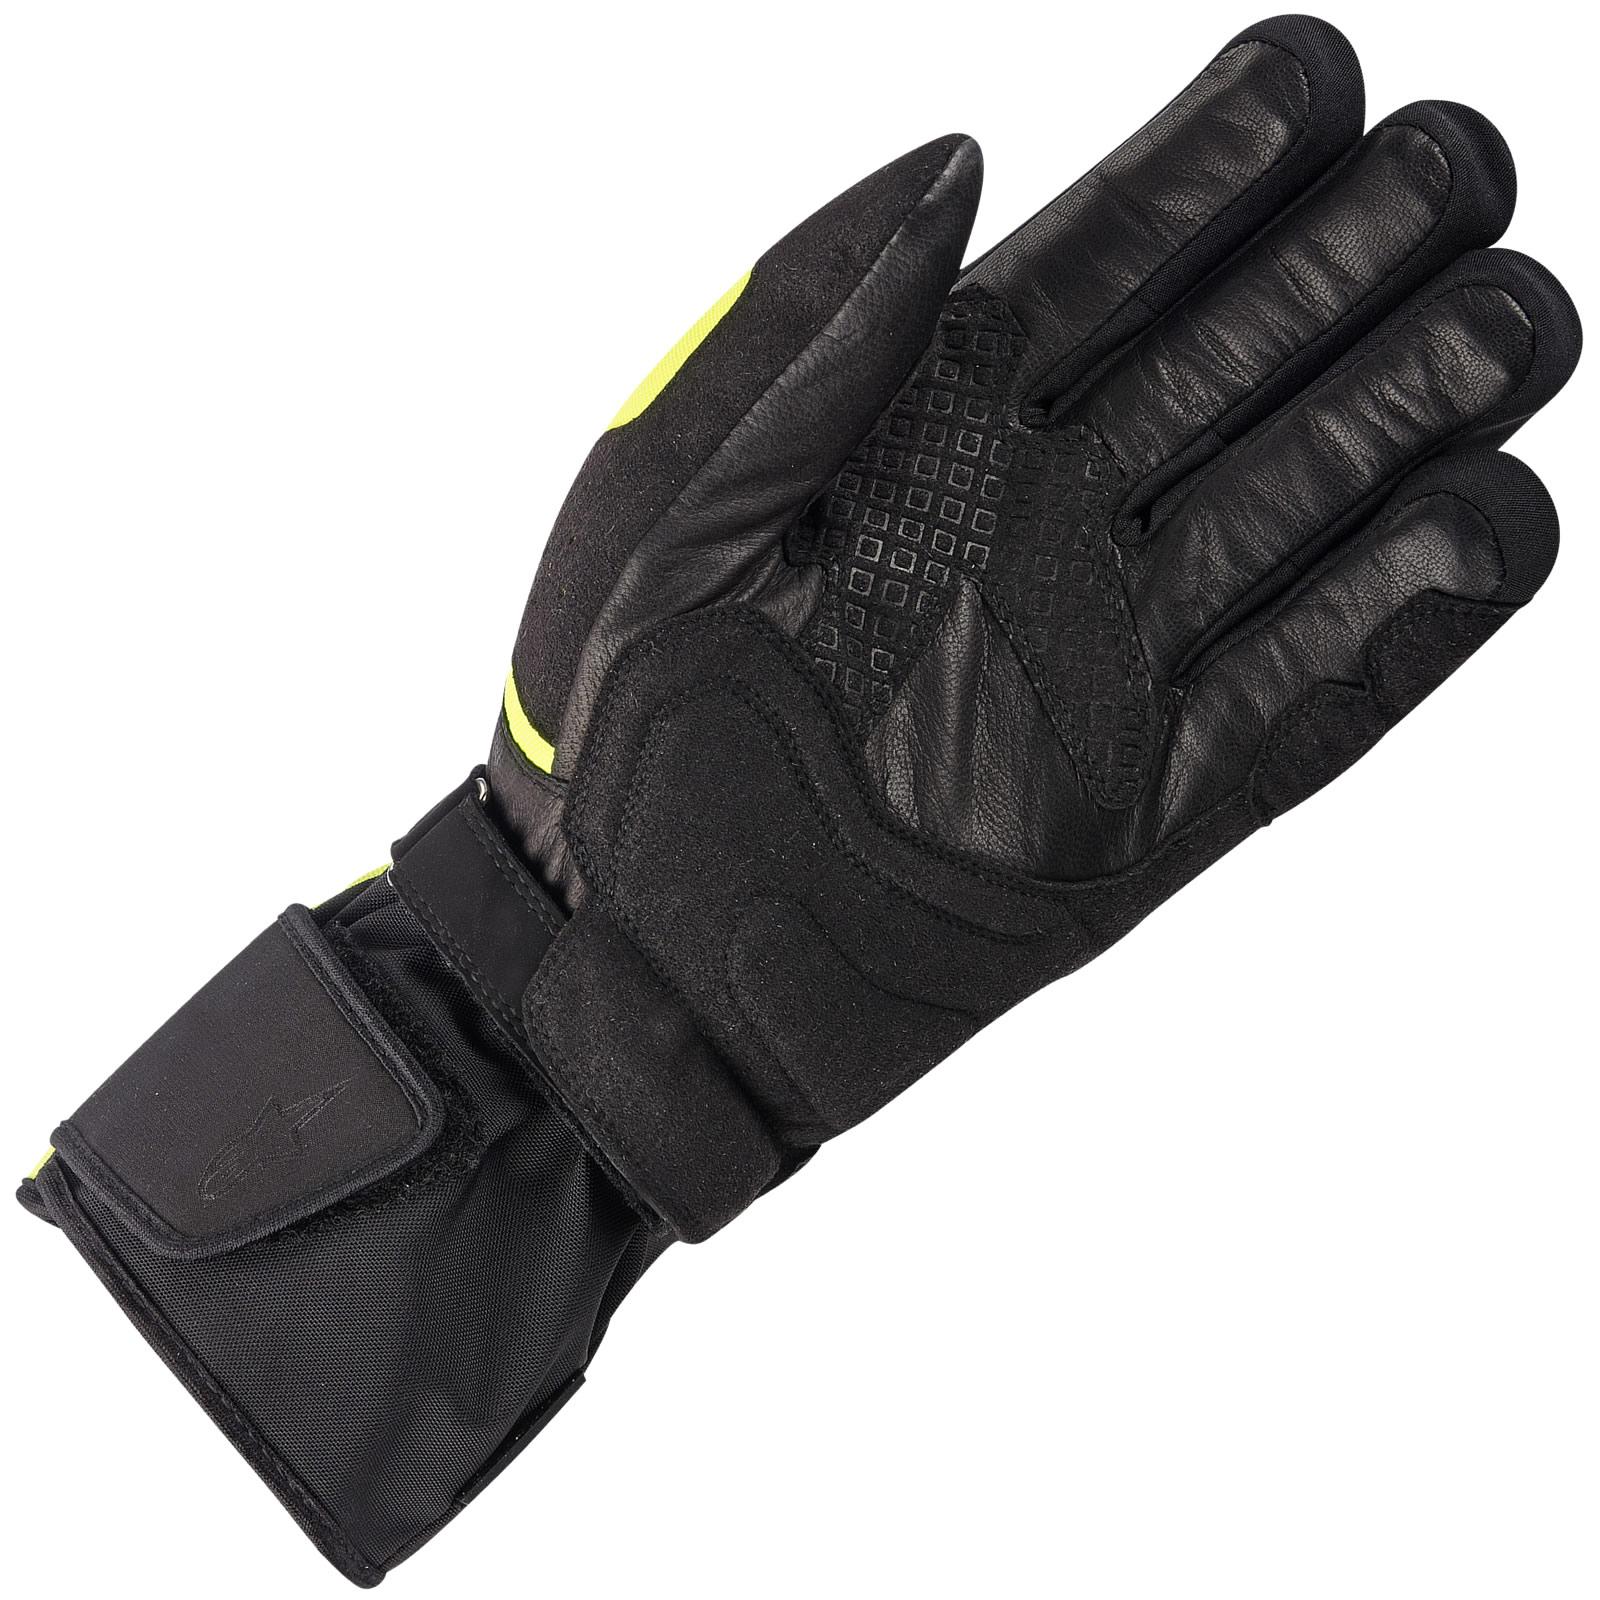 Heated motorcycle gloves new zealand - Thumbnail 5